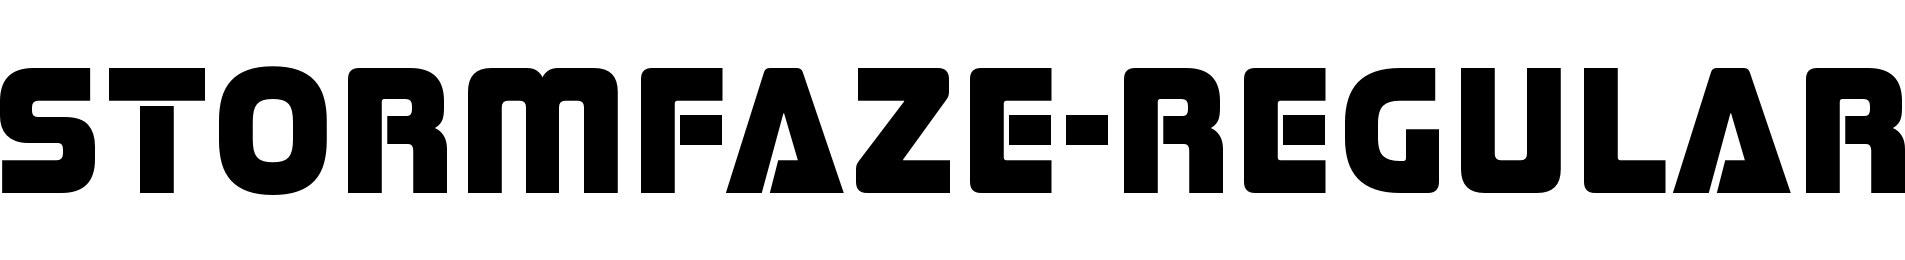 Stormfaze-Regular